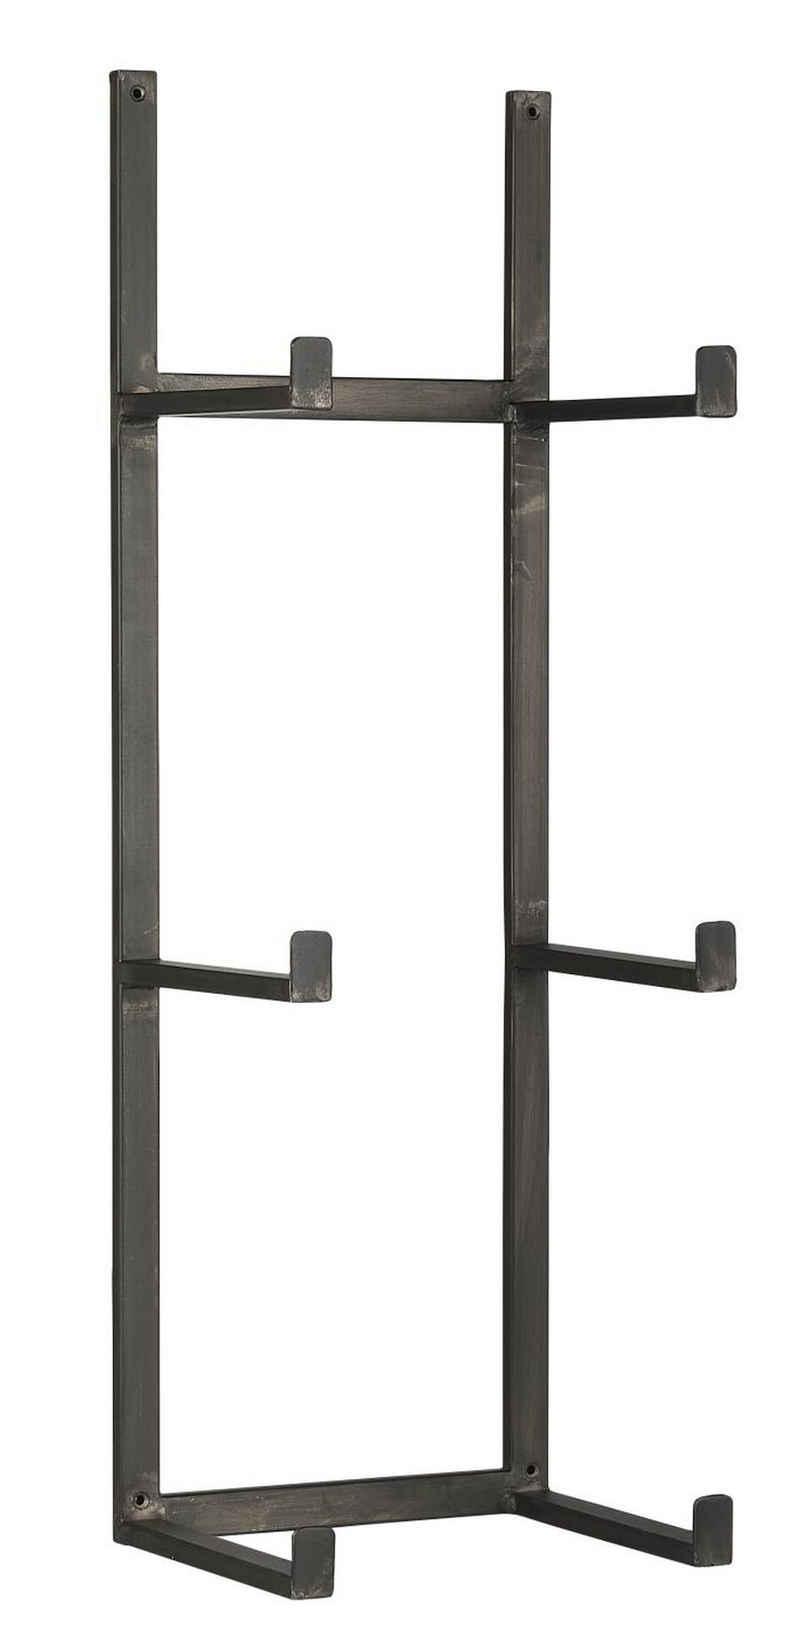 Ib Laursen Wandregal »2x Regalhalter Regalwinkel Regalträger 21cm Antikes Messing Ib Laursen 05994-17«